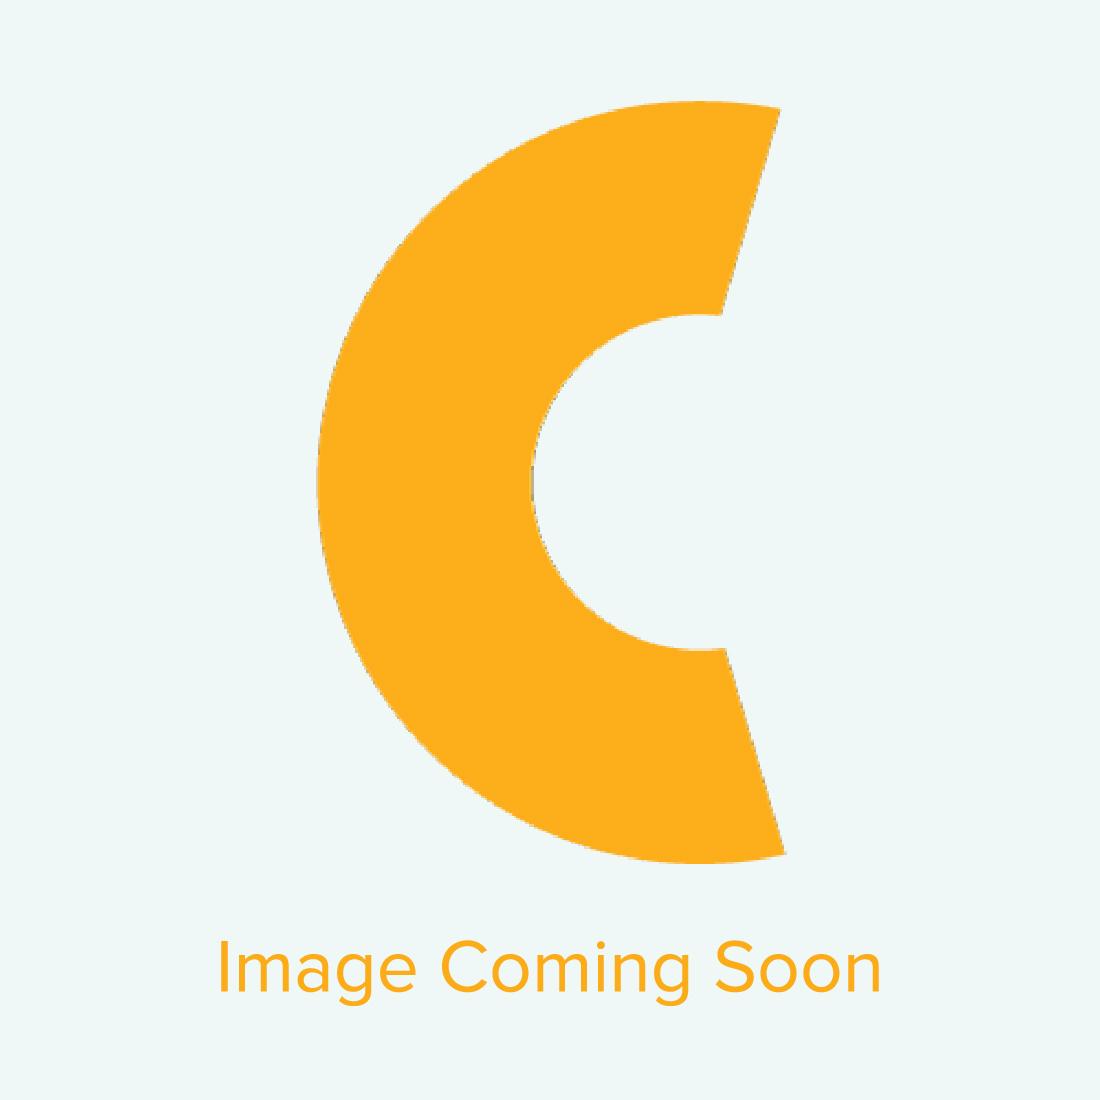 Flexi Grain Custom Report Covers (100pcs)